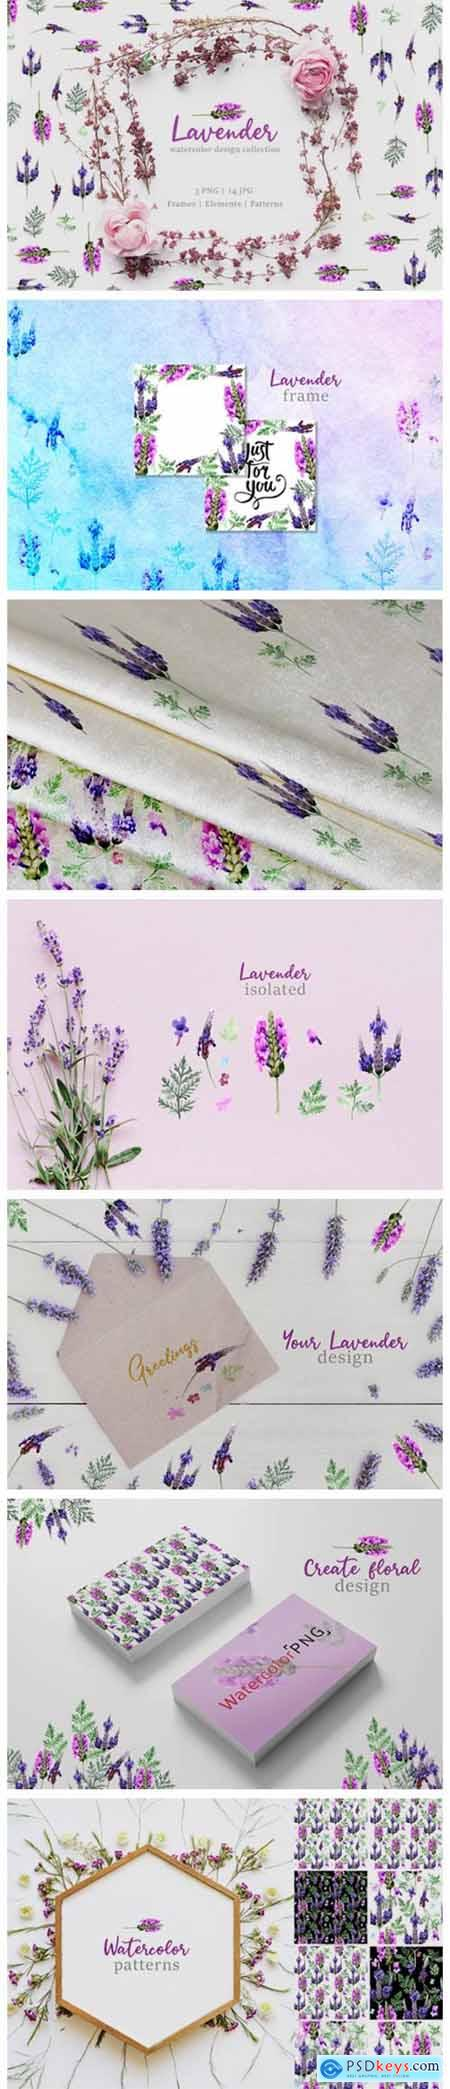 Lavender Watercolor 4750960